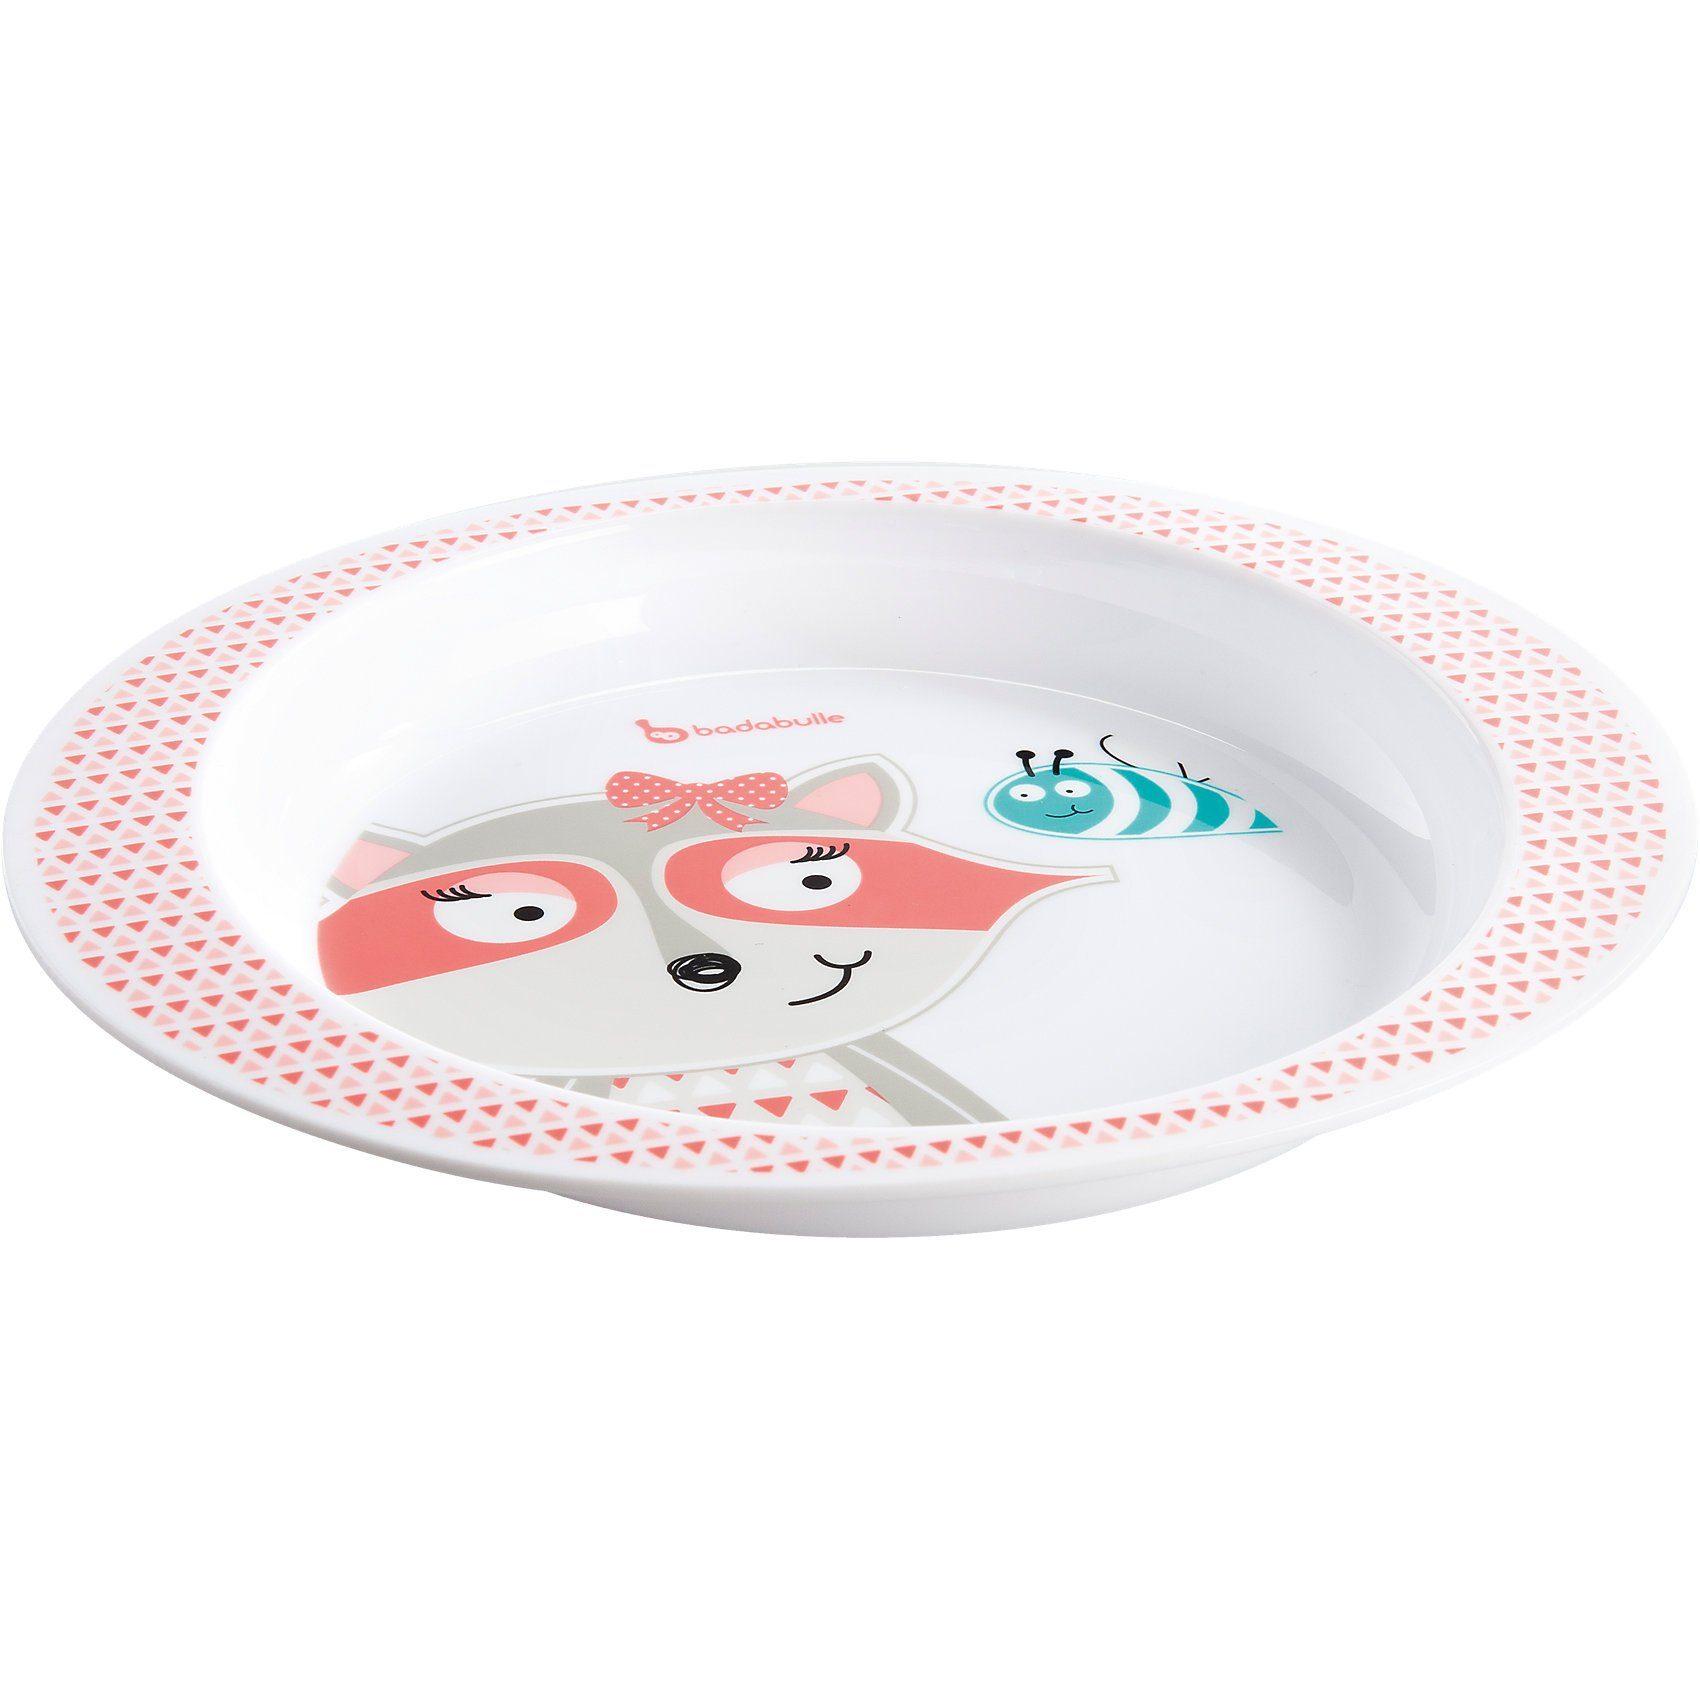 badabulle Teller für Mikrowelle, rosa